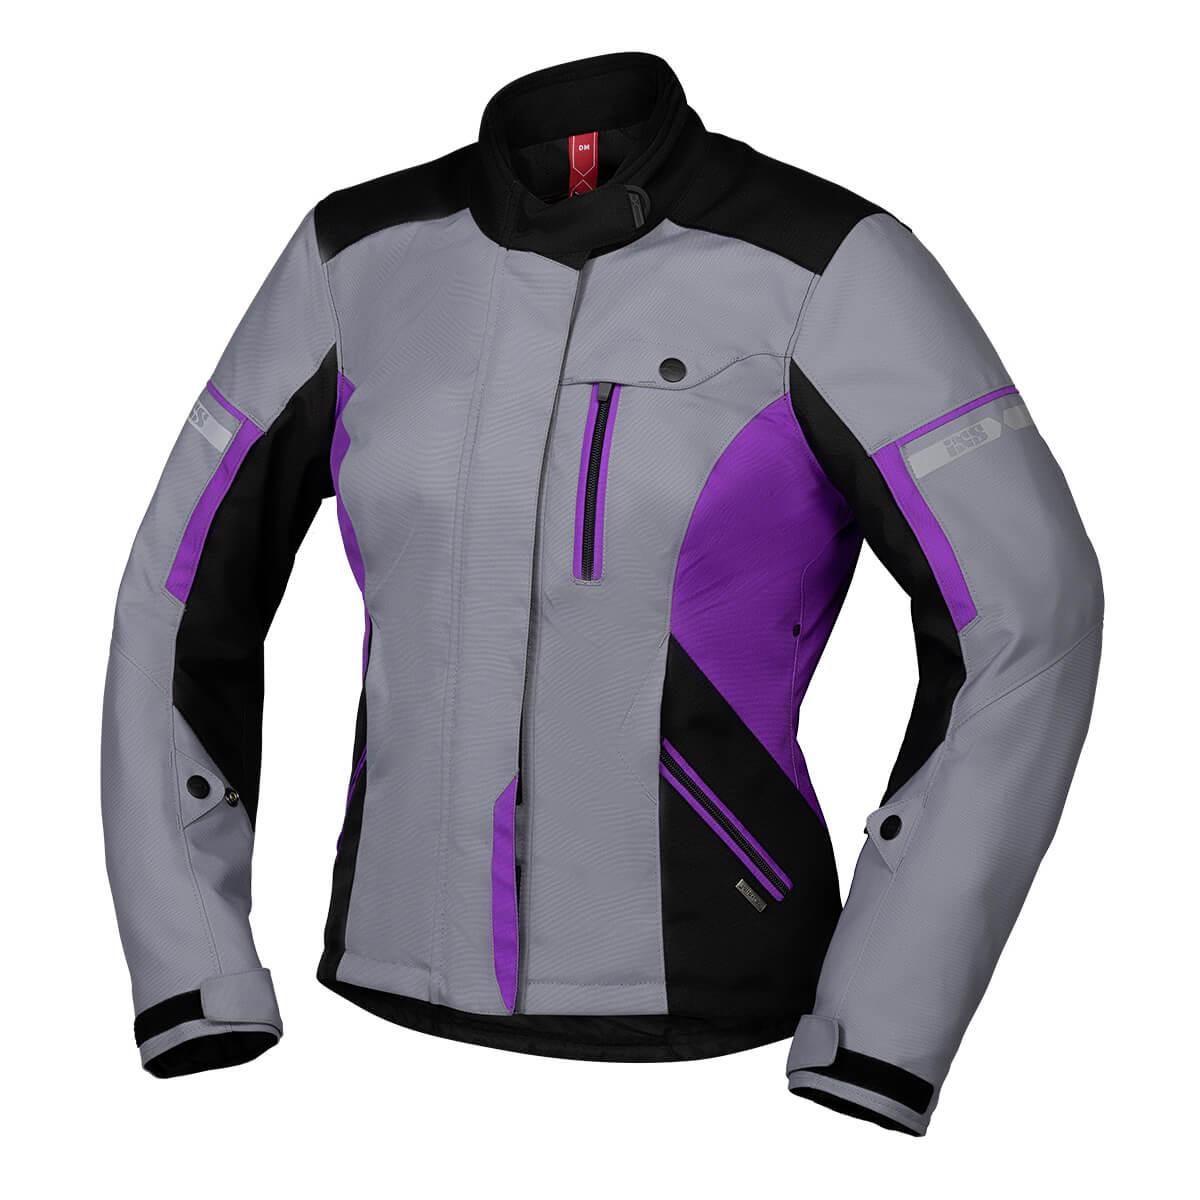 Jacke Tour Damen Finja ST 2.0 schwarz grau violett